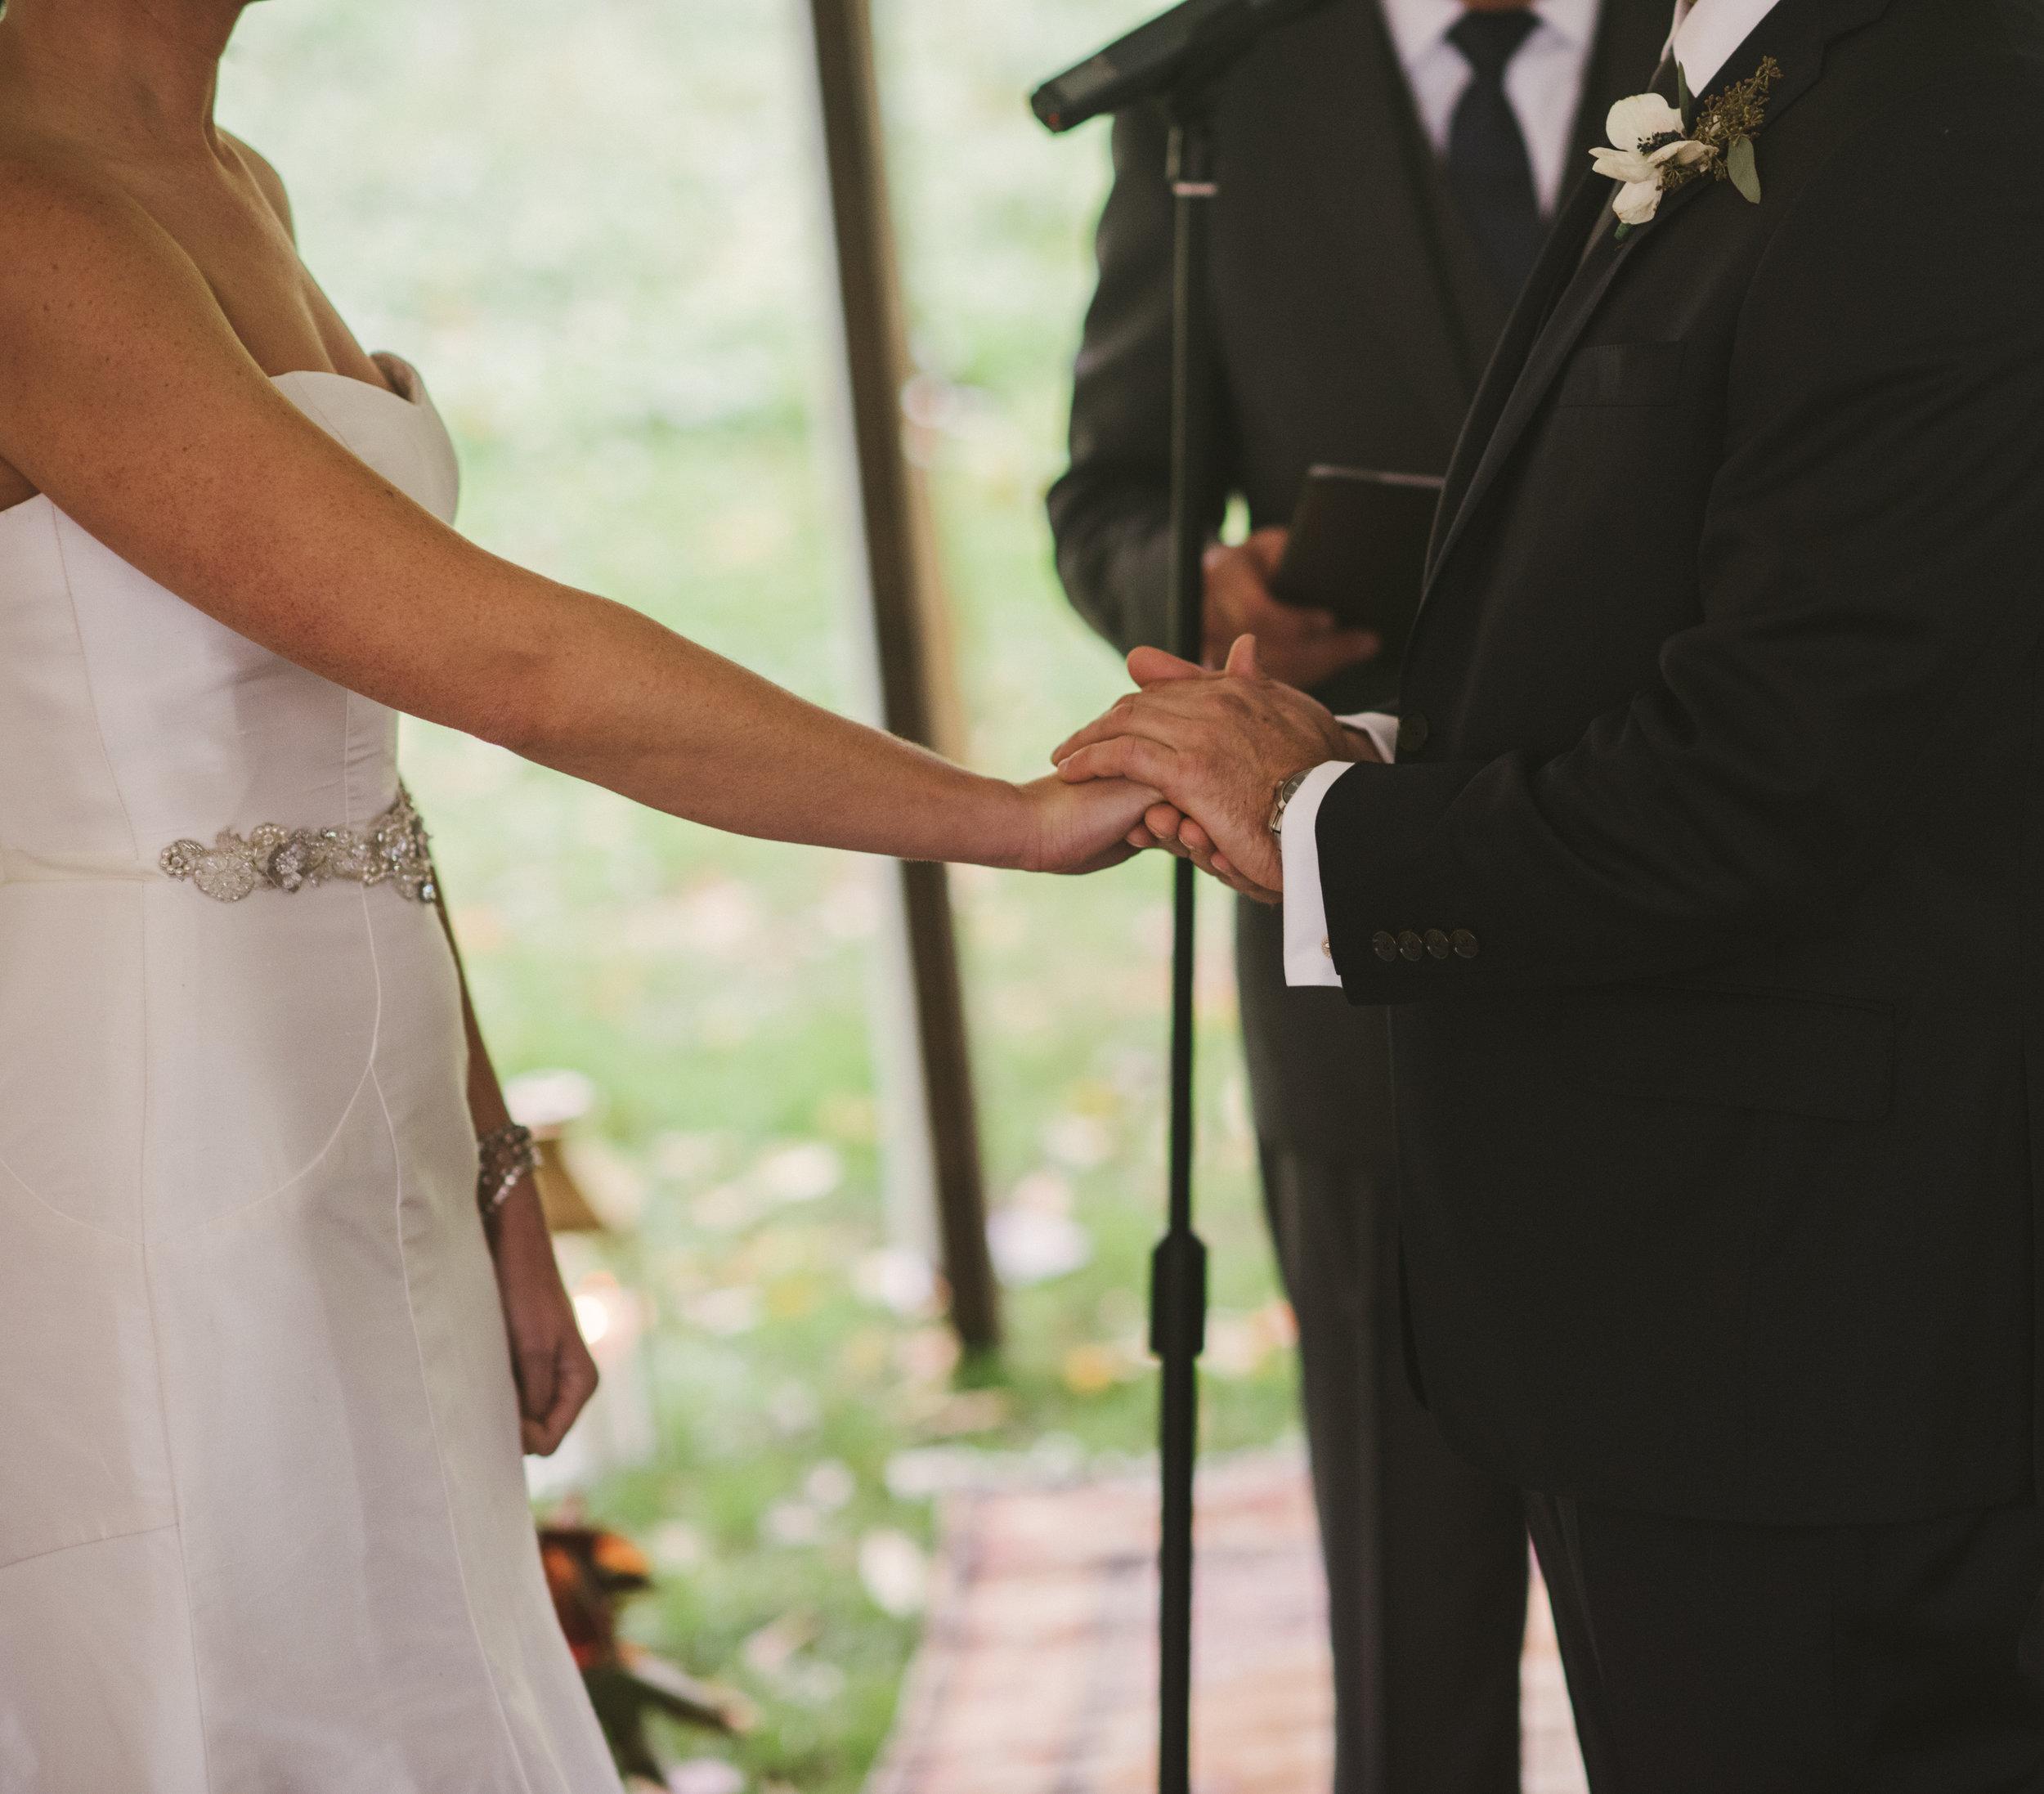 JACQUELINE & ANDREW WARSHAWER -BROOKMILL FARM FALL WEDDING - INTIMATE WEDDING PHOTOGRAPHER - TWOTWENTY by CHI-CHI AGBIM-225.jpg